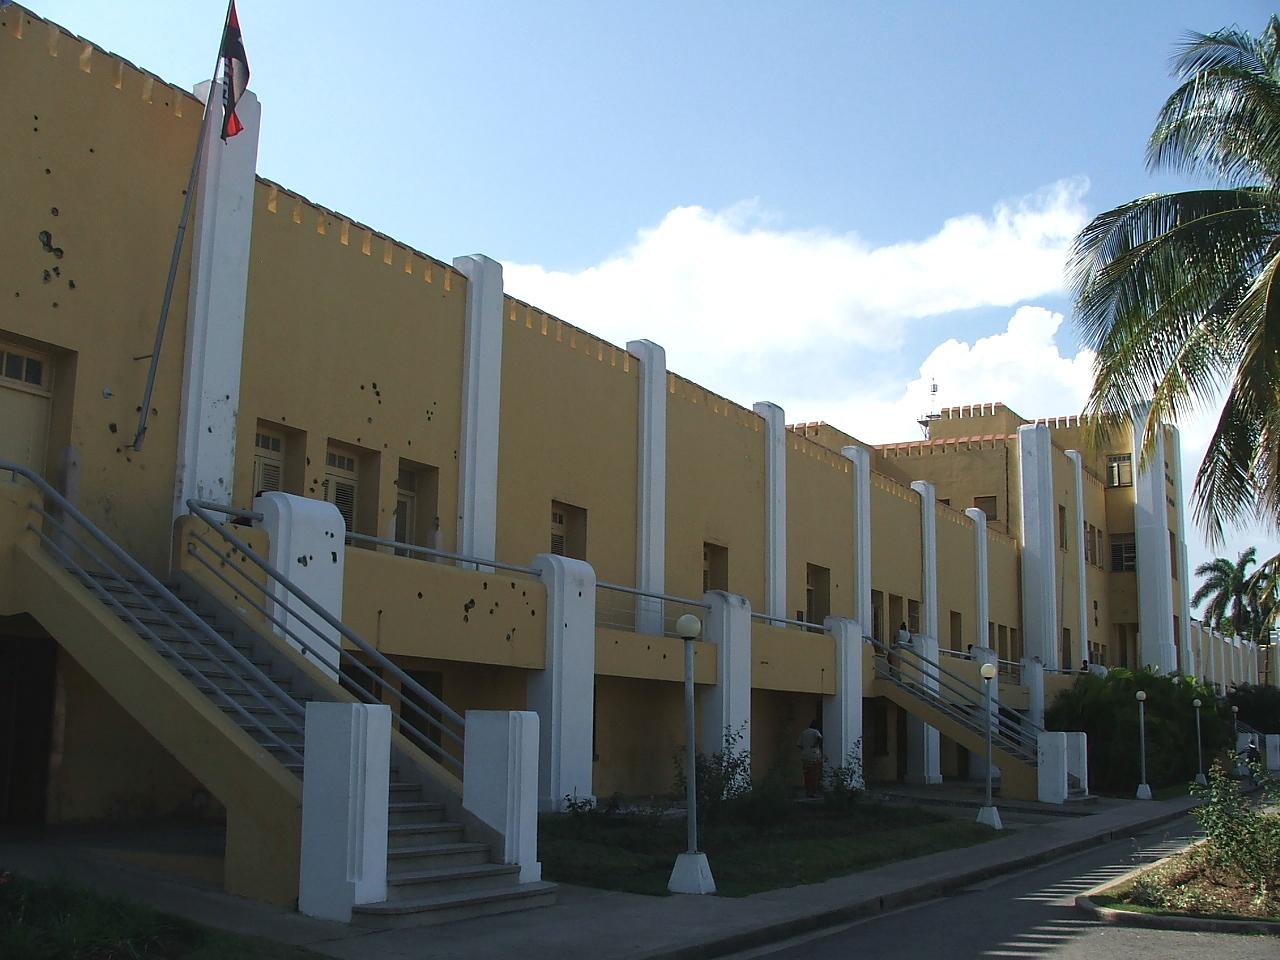 Image result for cuba fidel castro attacks moncada barracks